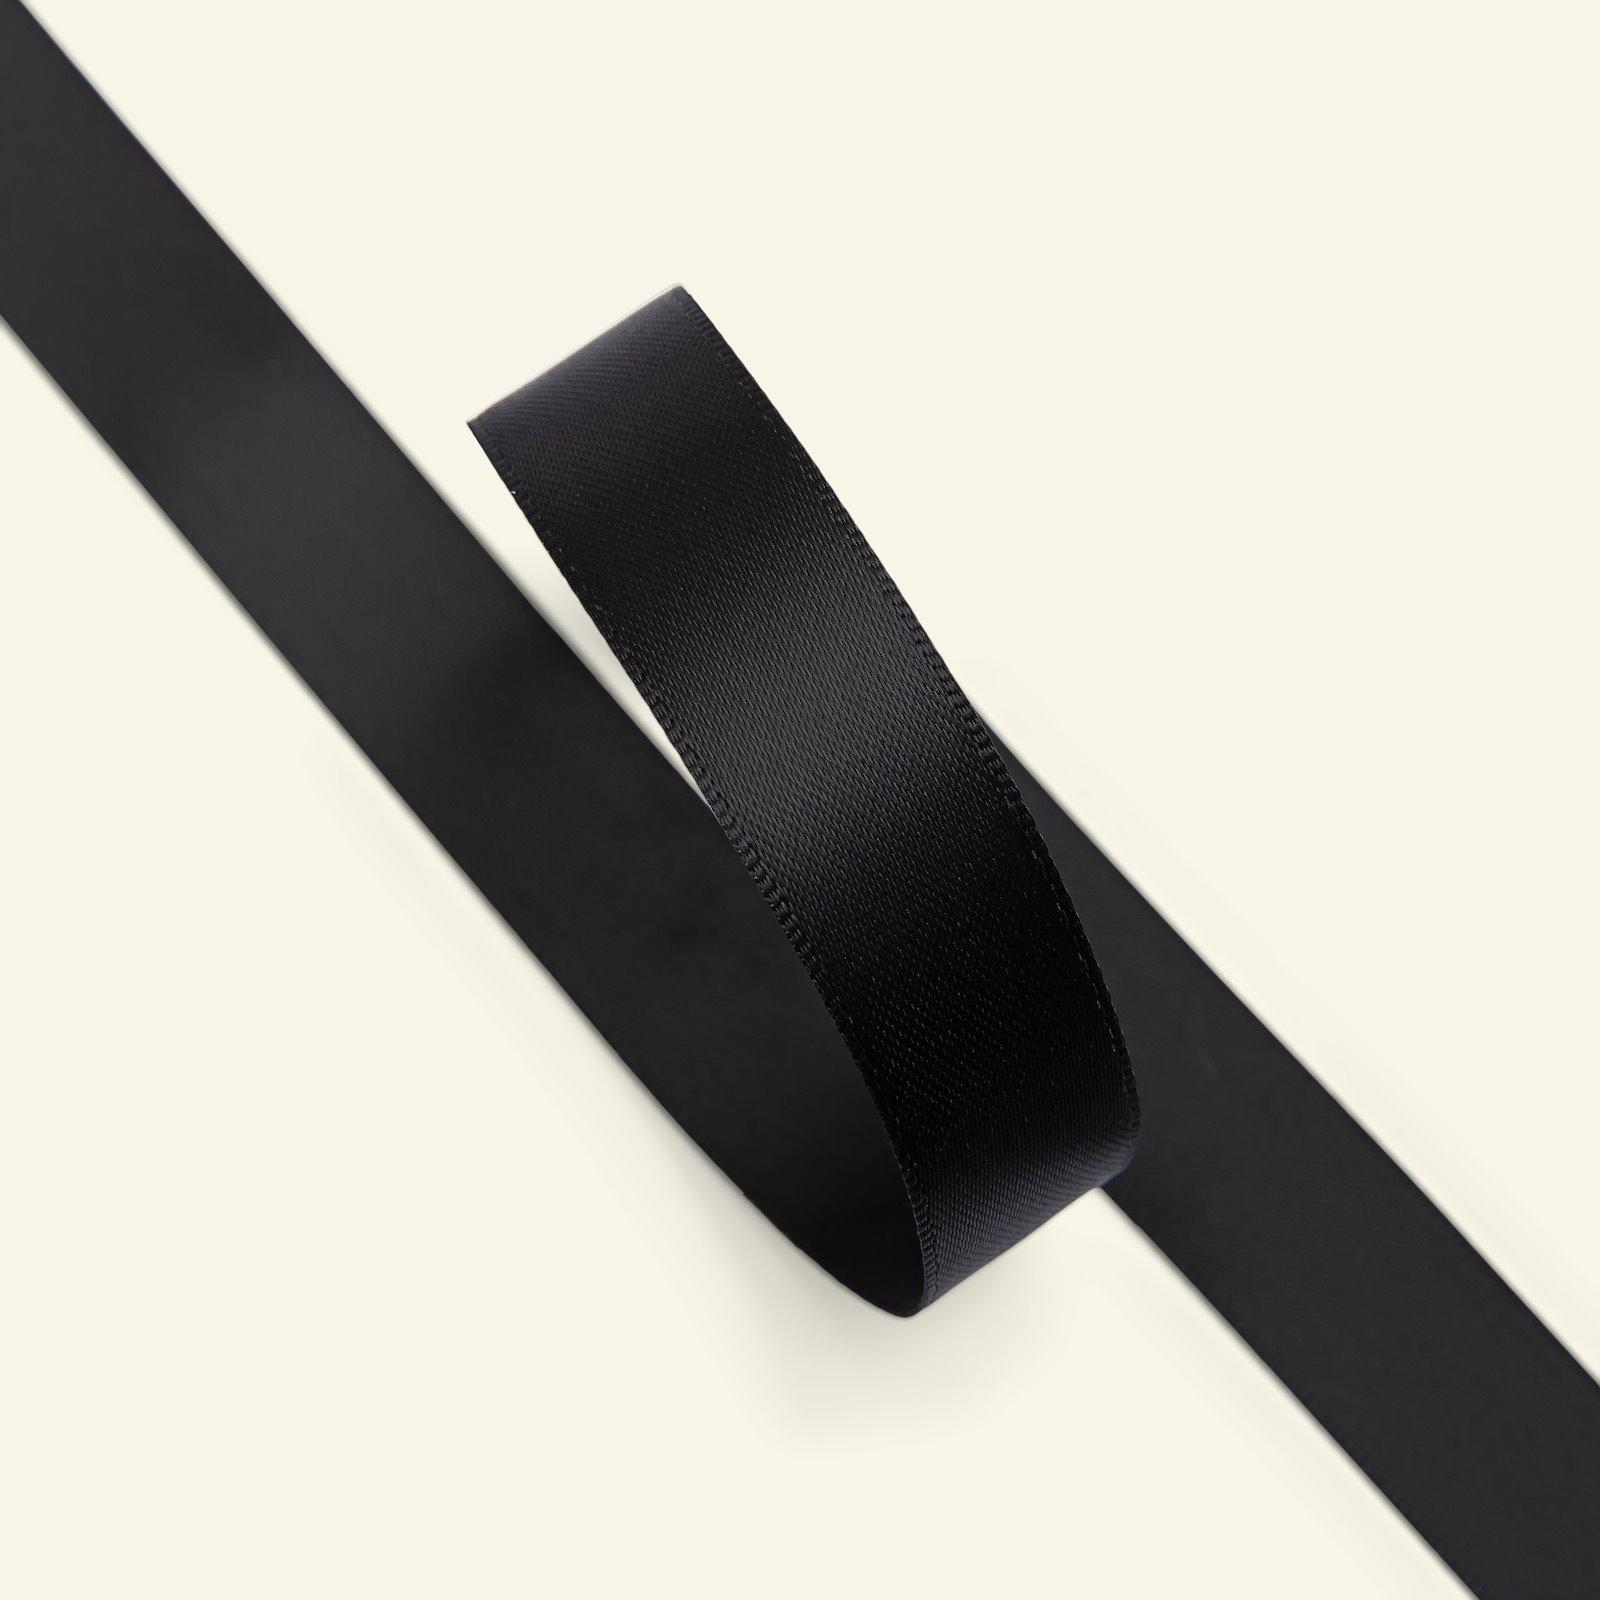 Satin ribbon 15mm black 25m 27343_pack